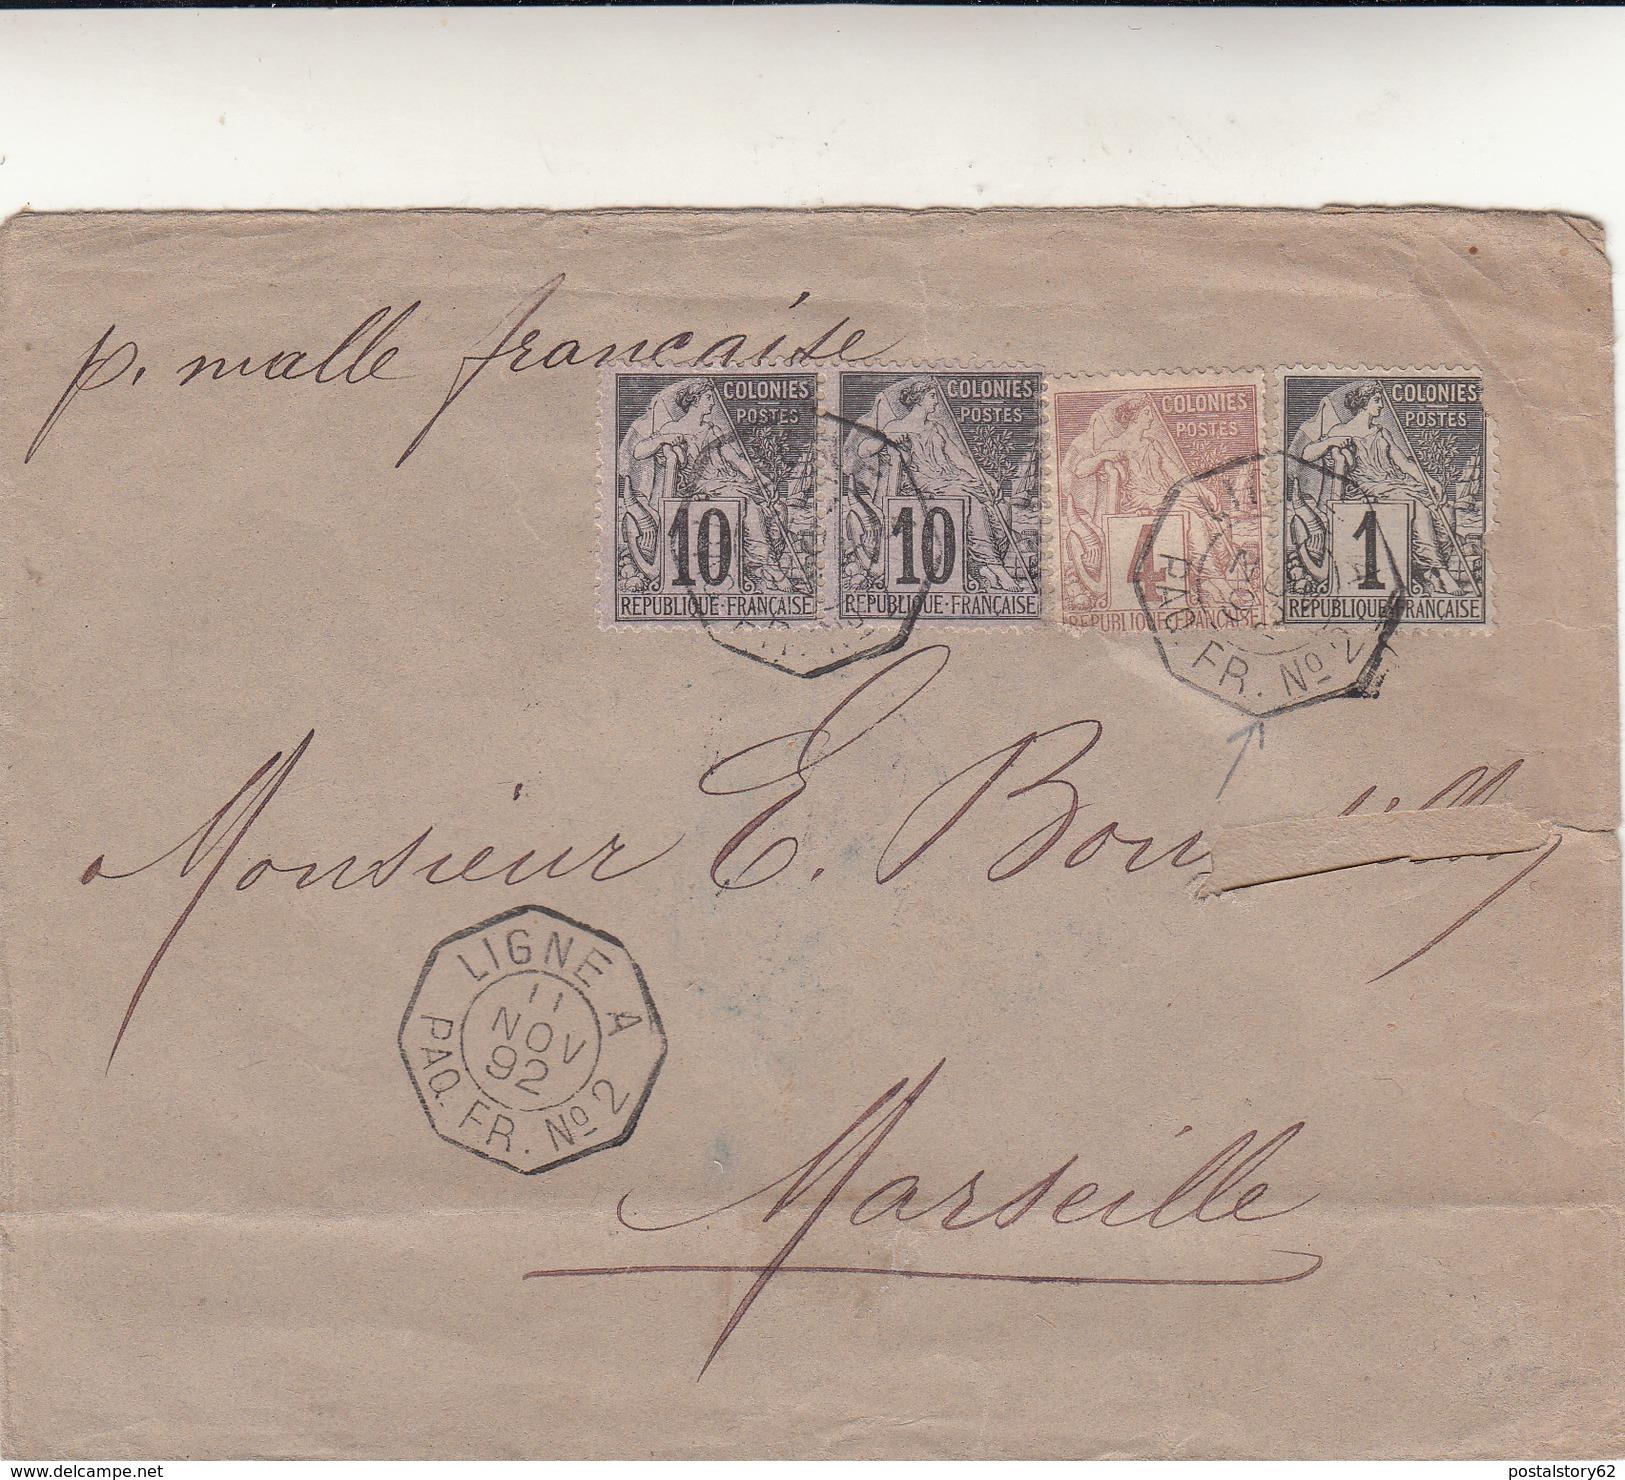 Saint Pierre Martinique To Marseille. Cover Avec Timbres Ligne A Paq. Fr. N°2 Anno 1892 - France (ex-colonies & Protectorats)